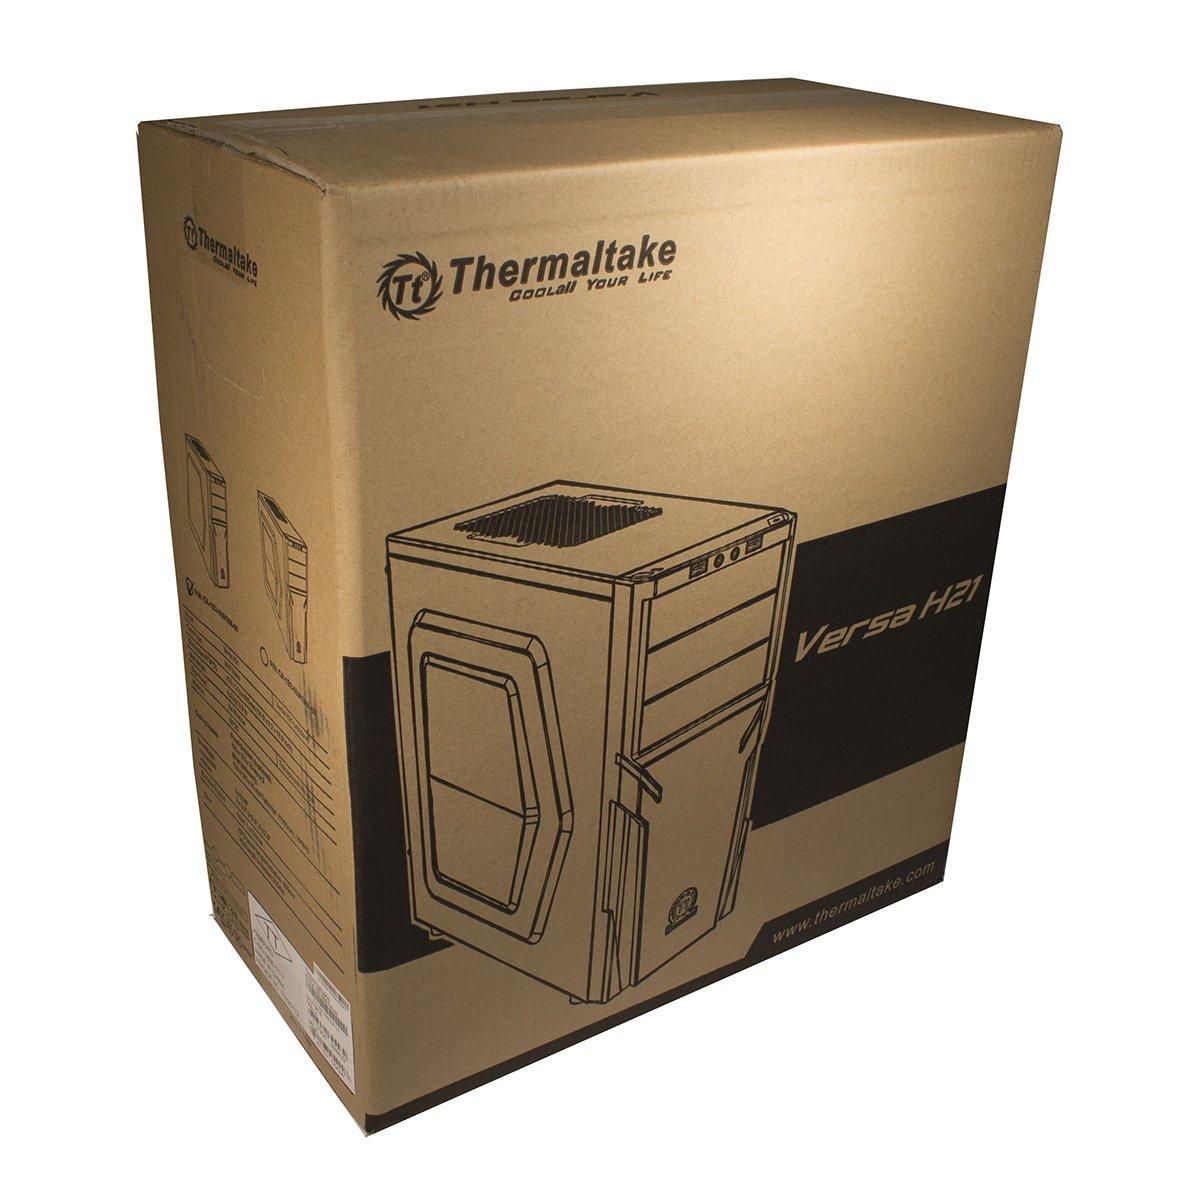 schwarz Thermaltake VERSA H23 MIDI Tower Geh/äuse 1x USB 2.0//USB 3.0